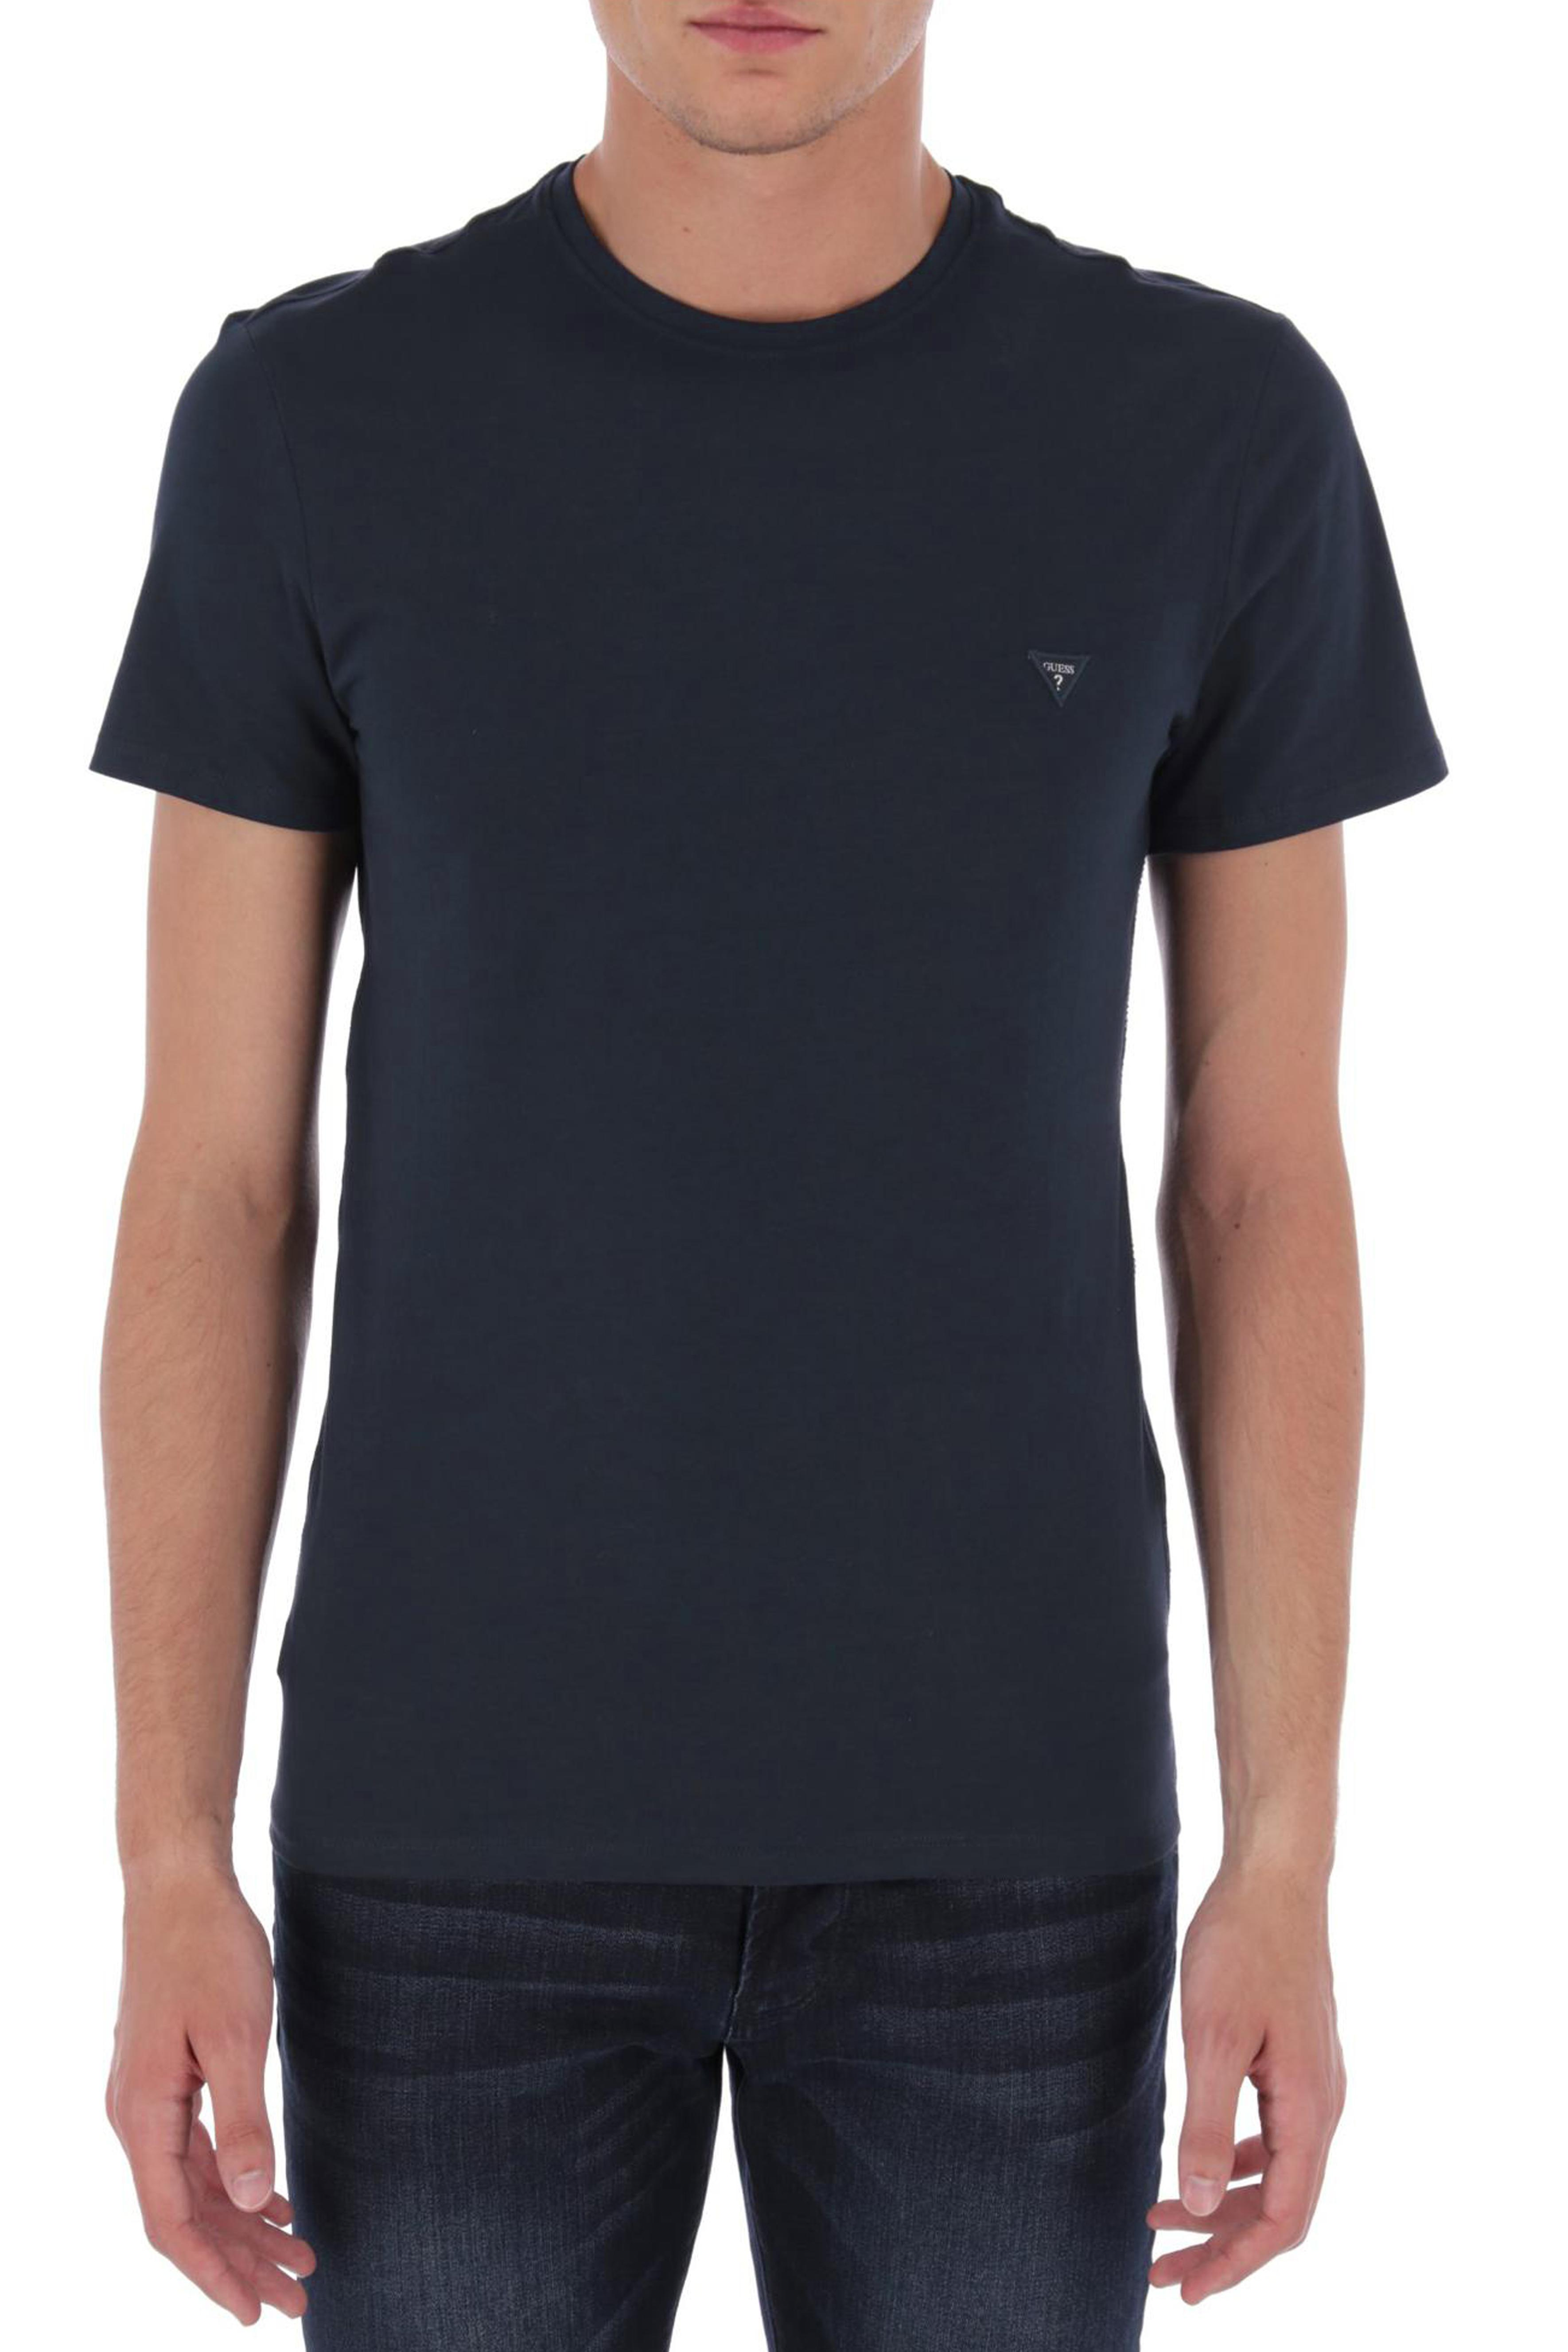 T-shirt super slim GUESS | T-shirt | M84I73 J1300G720